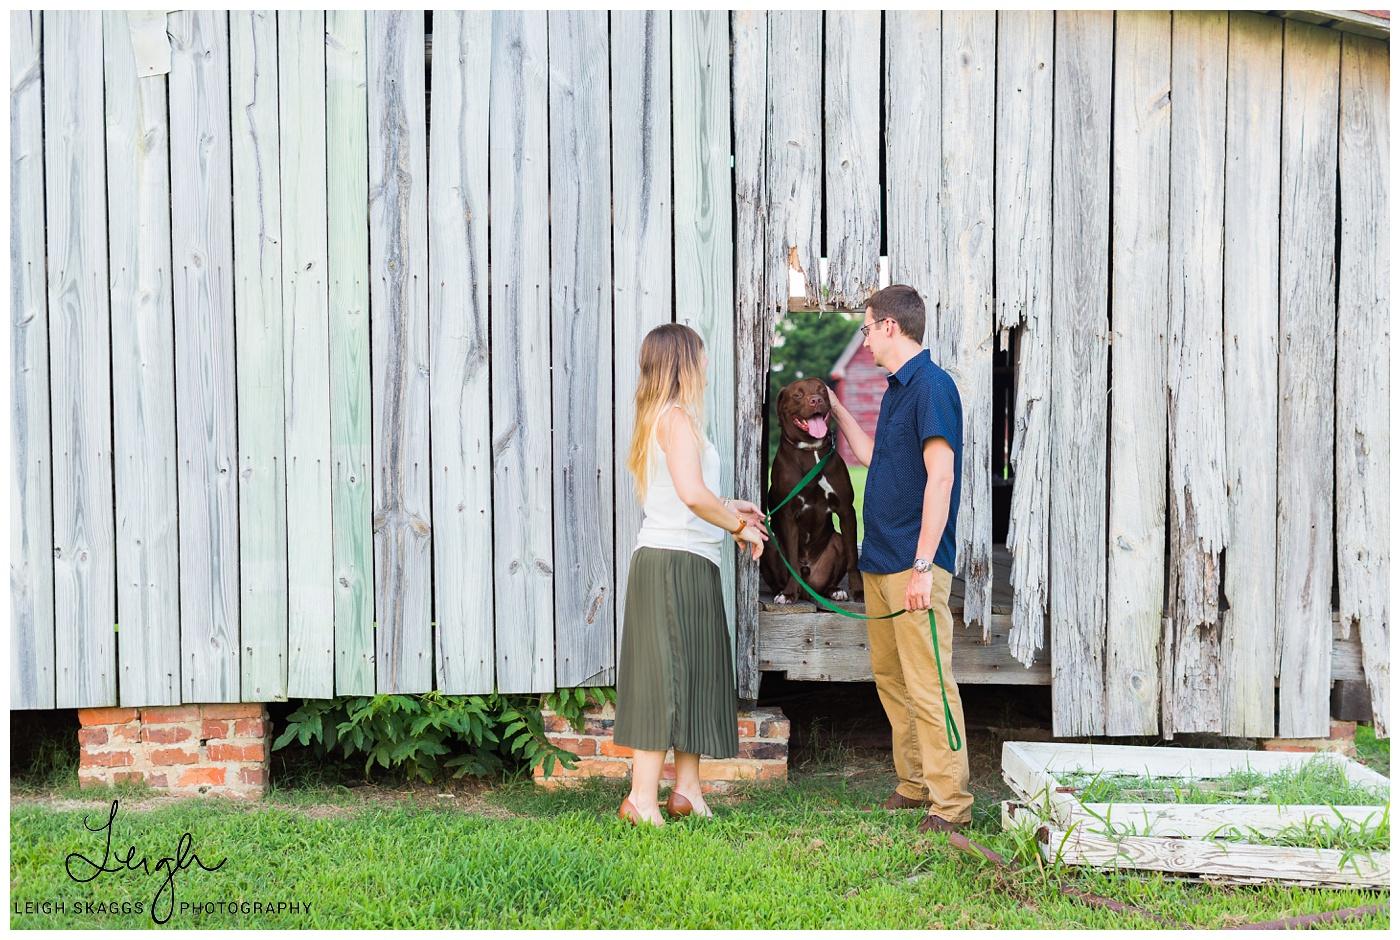 Anna & Andy | Windsor Castle Park Engagement